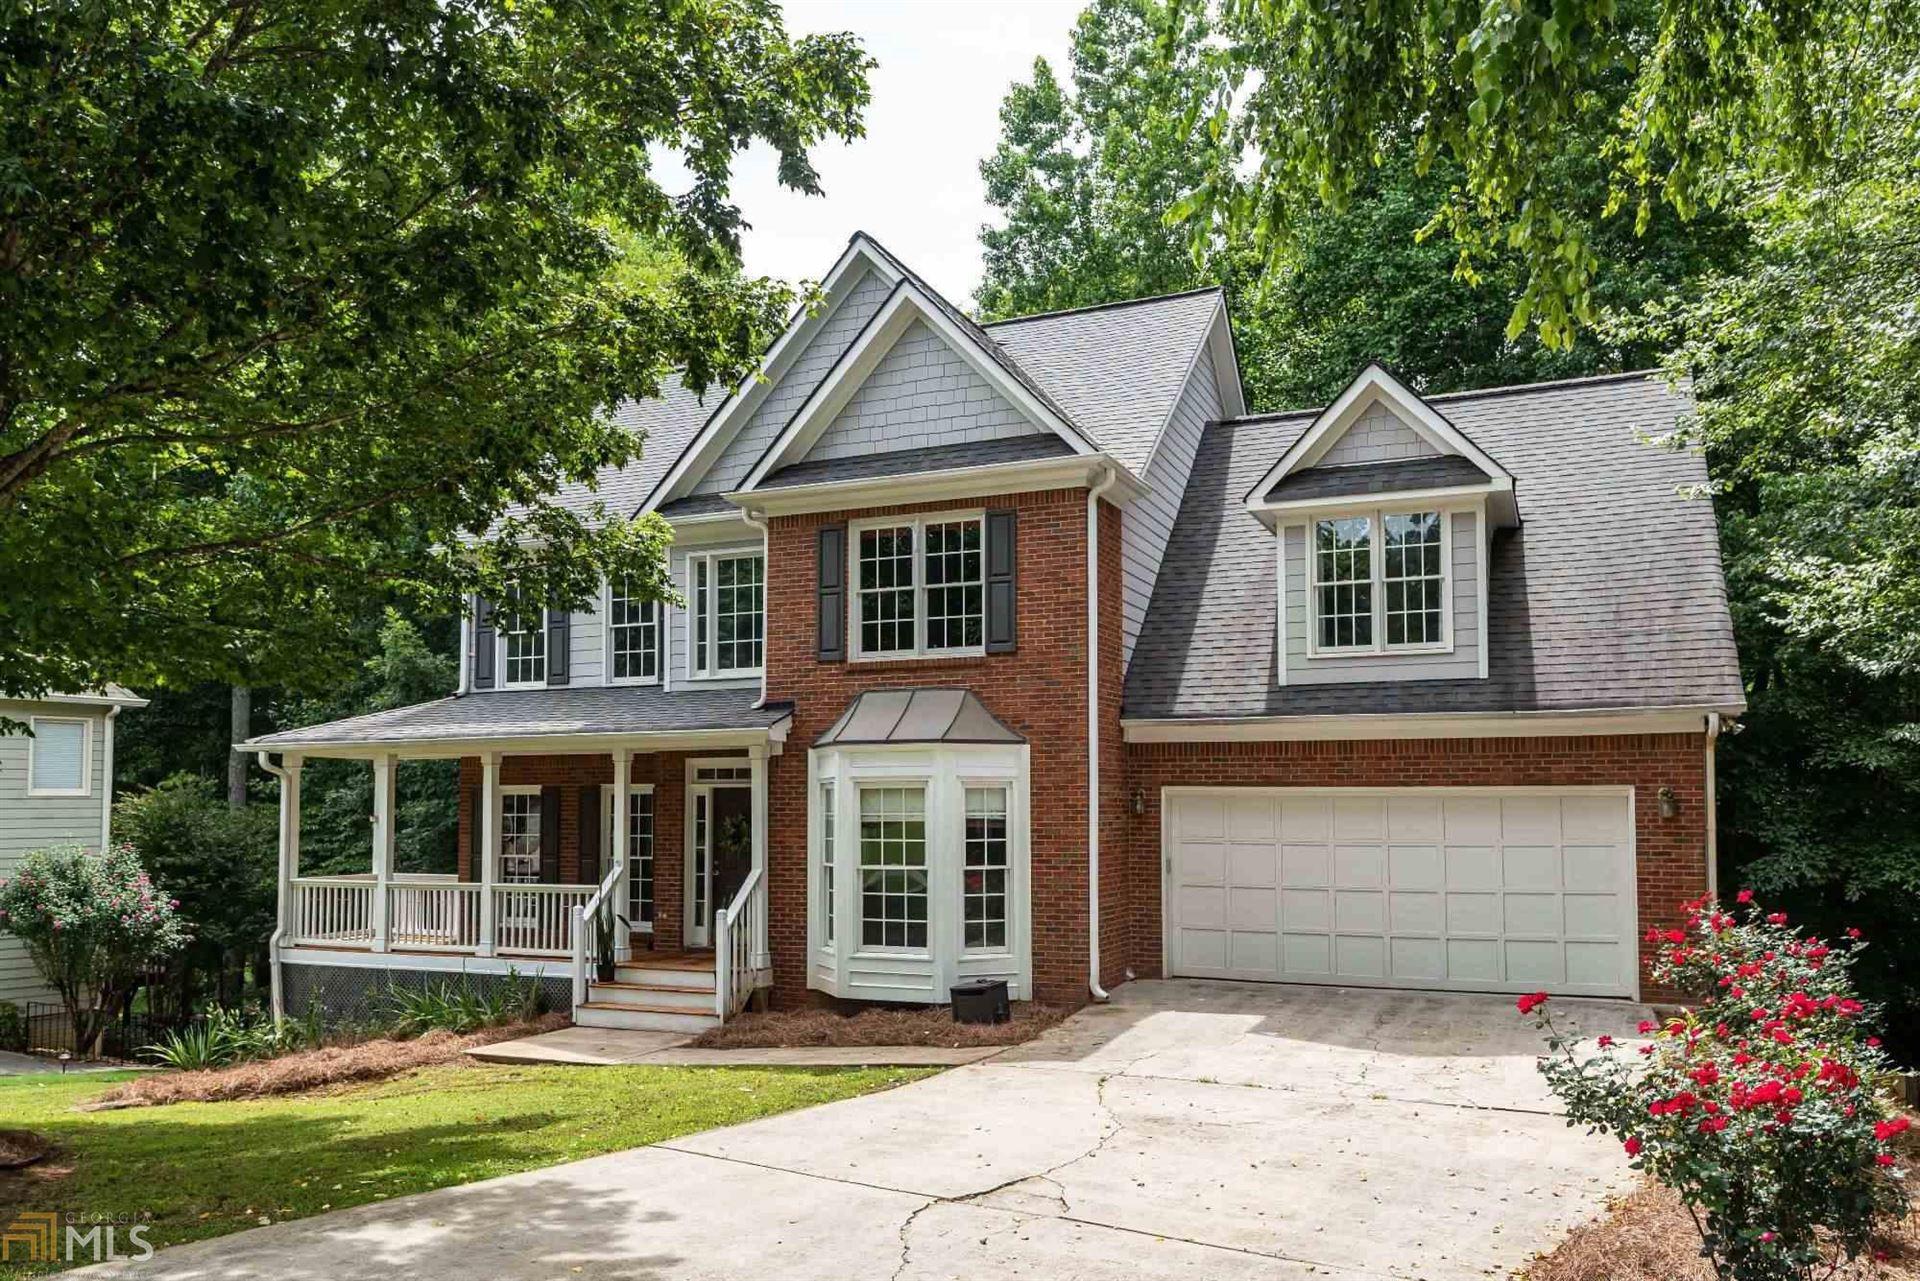 1524 Grace Meadows Ln, Smyrna, GA 30082 - MLS#: 8811965